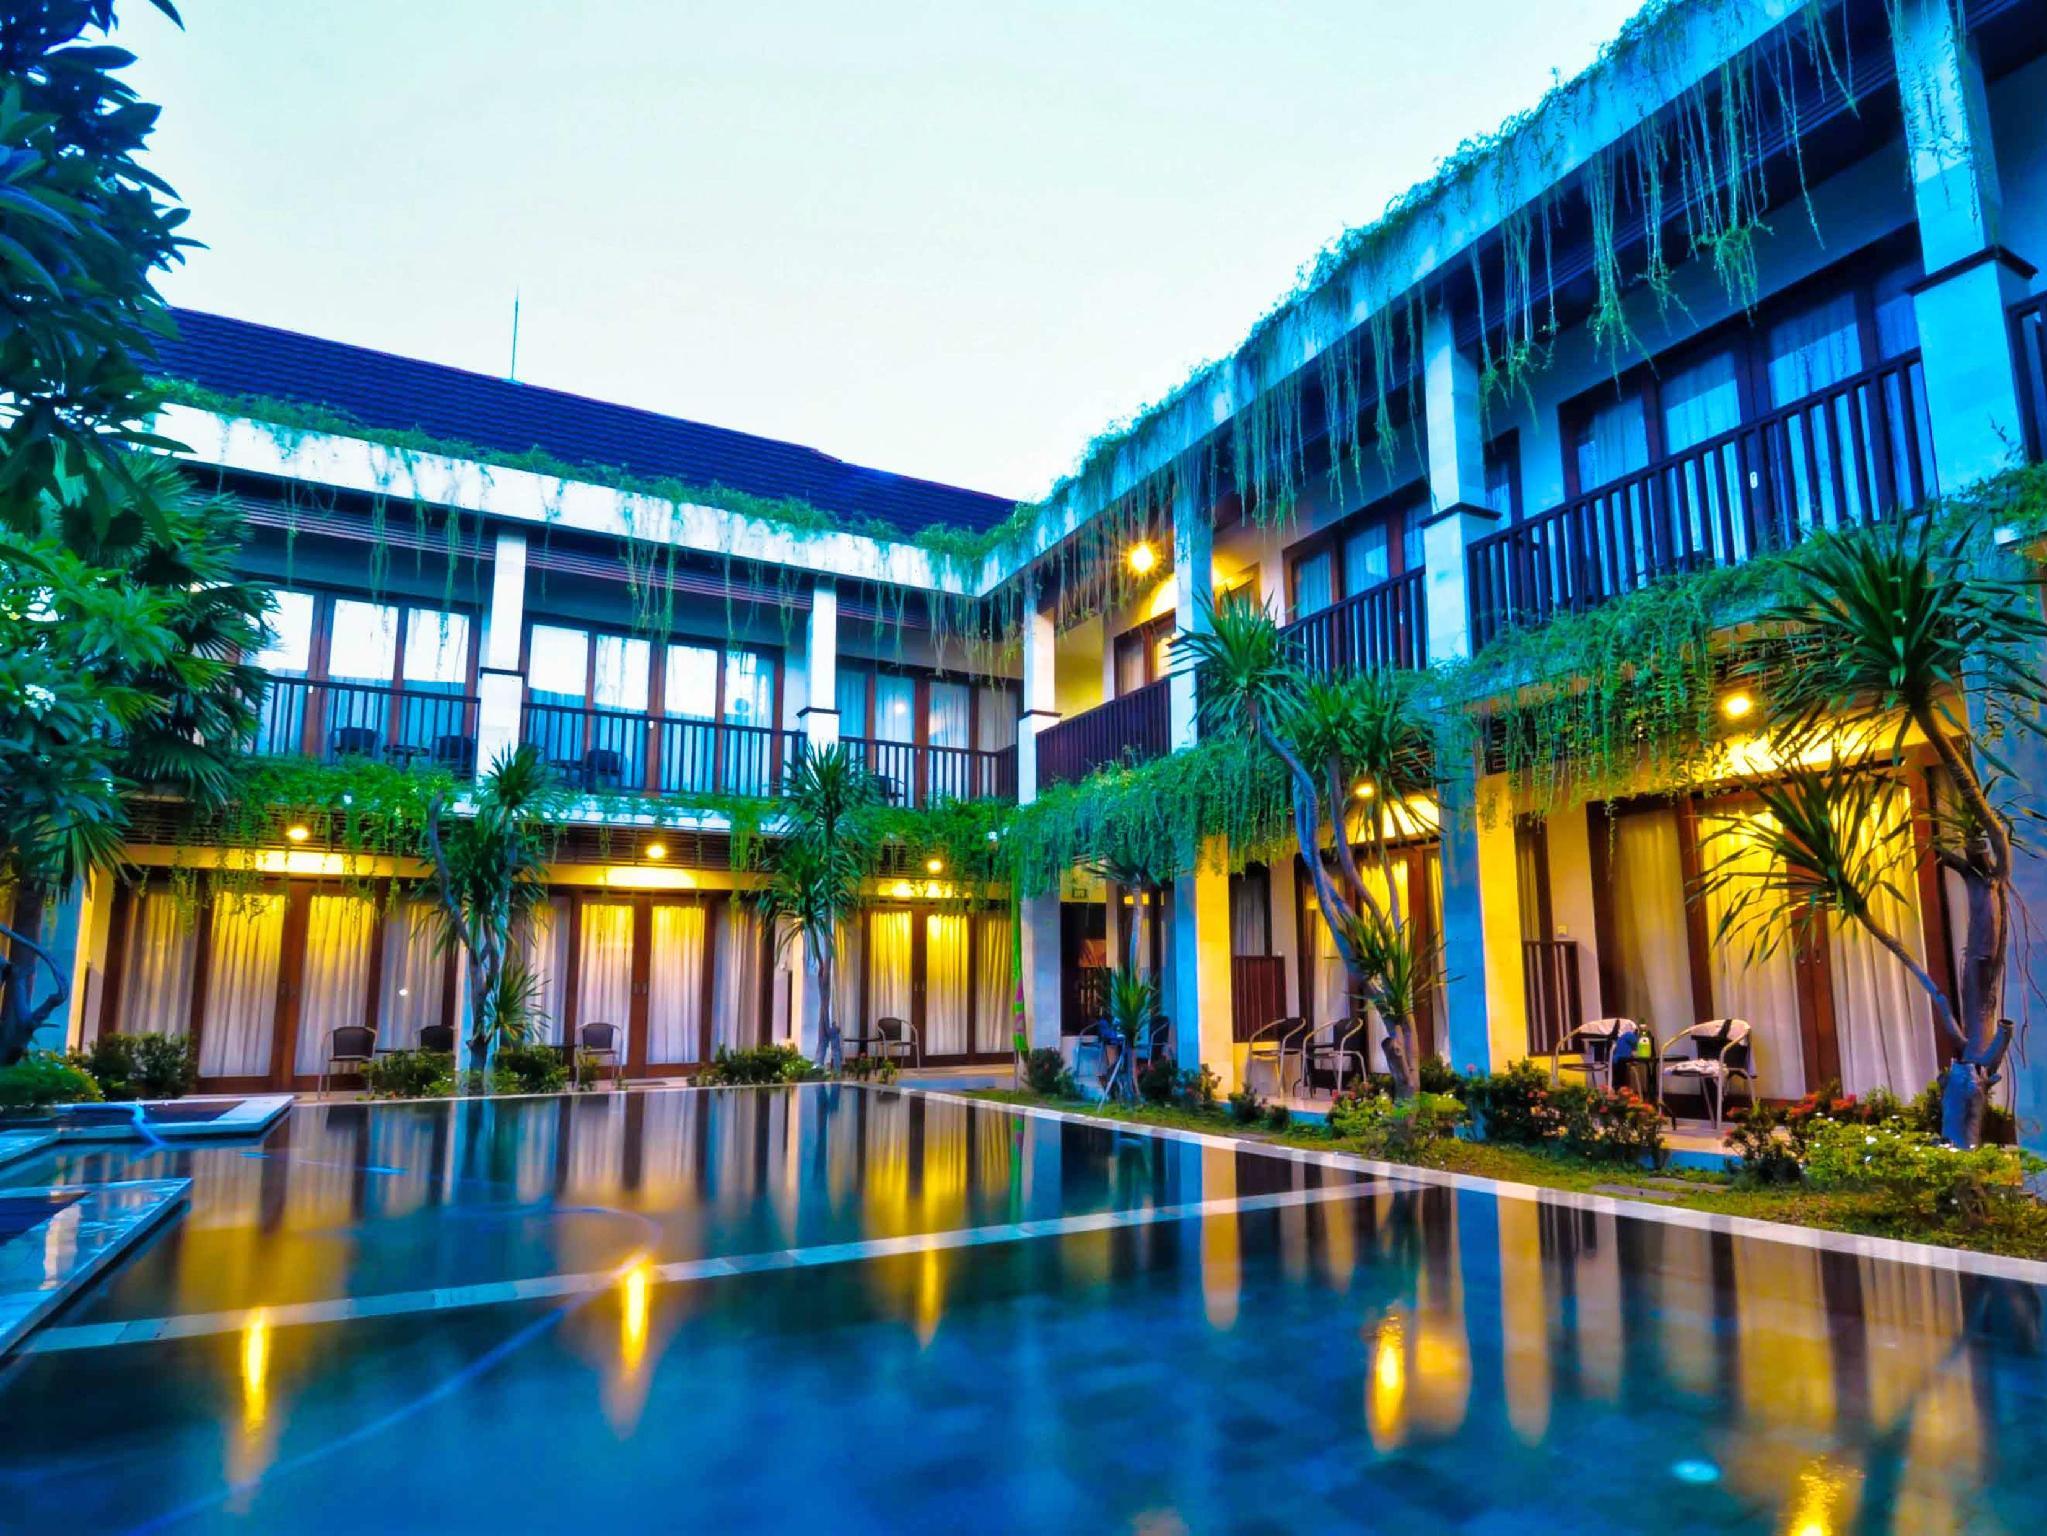 The Griya Sanur Bali